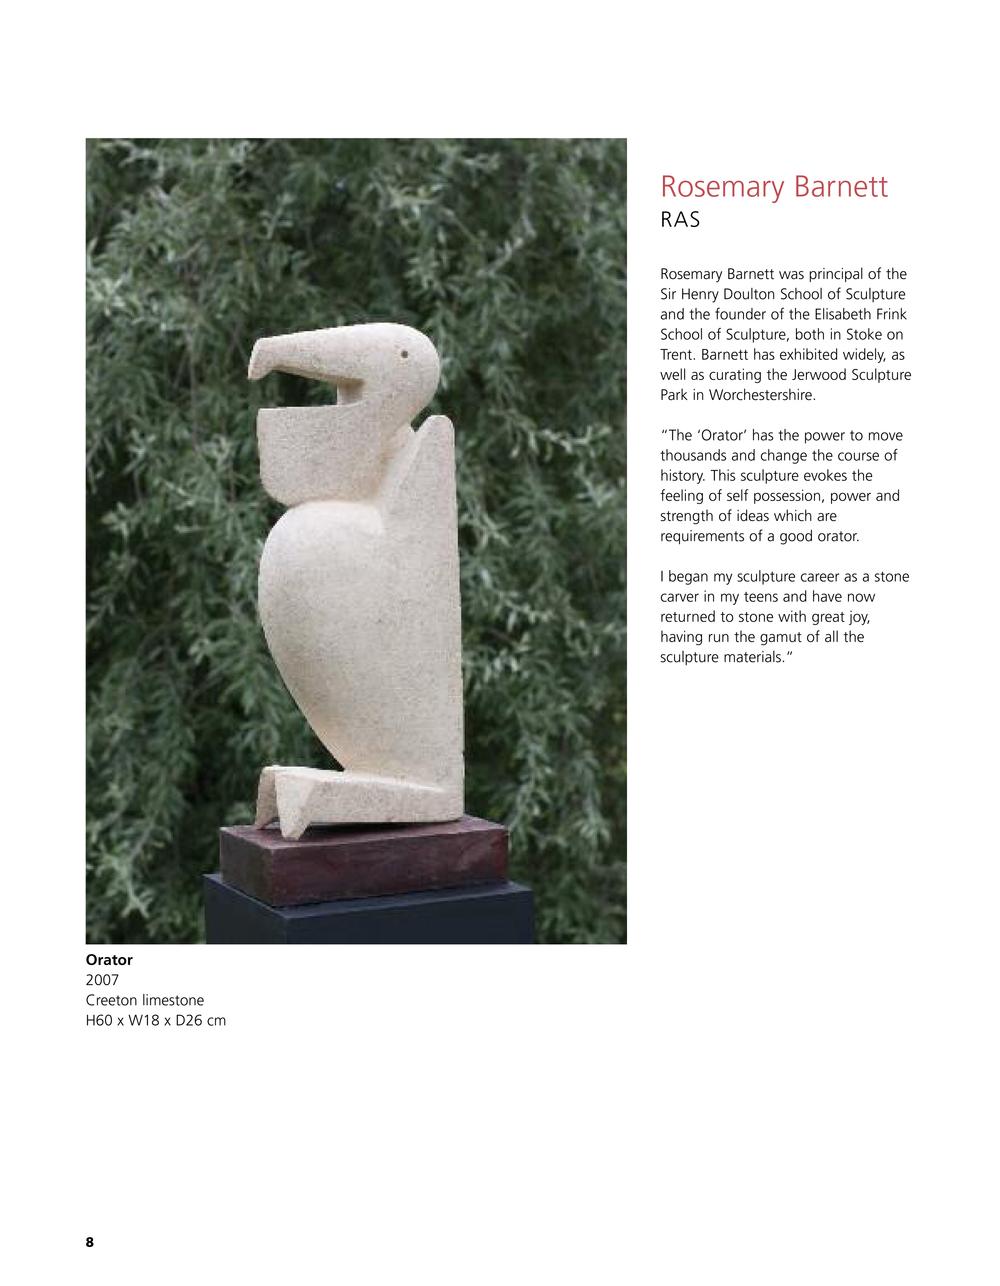 sculpturebooklet 2010 Leicester-8.jpg